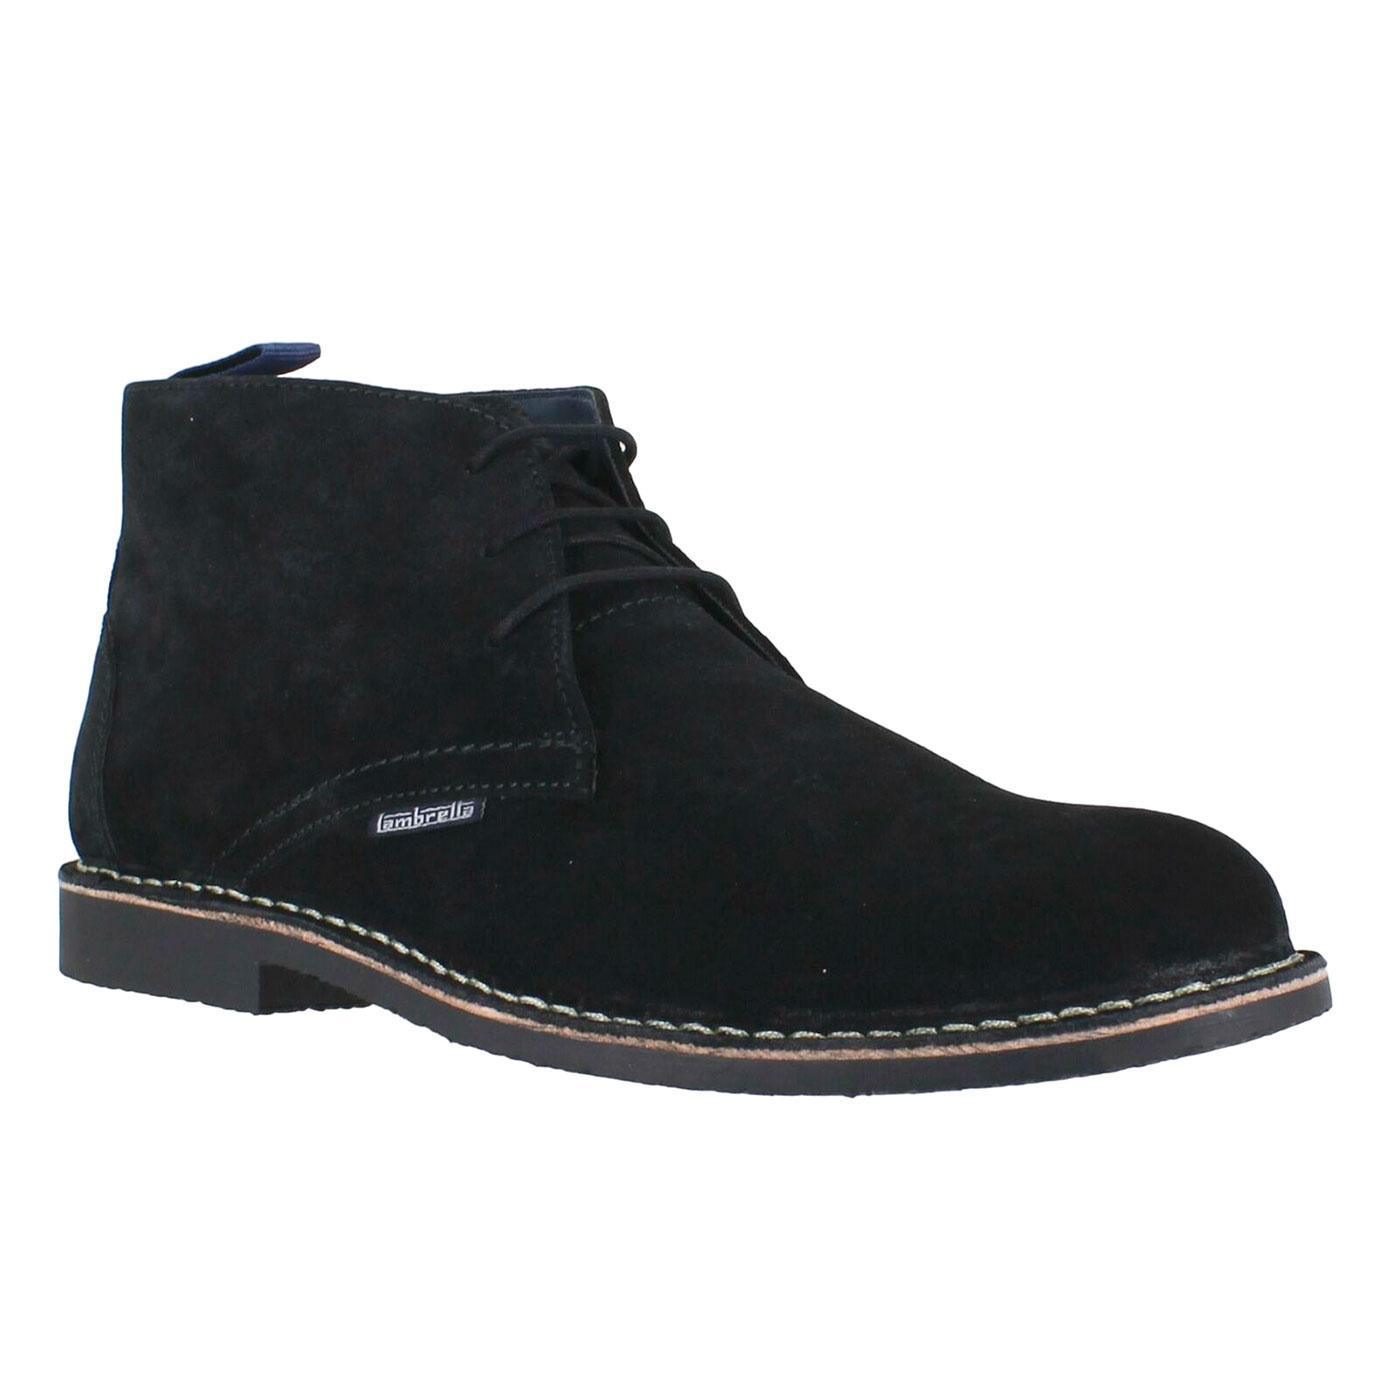 LAMBRETTA Men's 60s Mod Suede Desert Boots (Black)